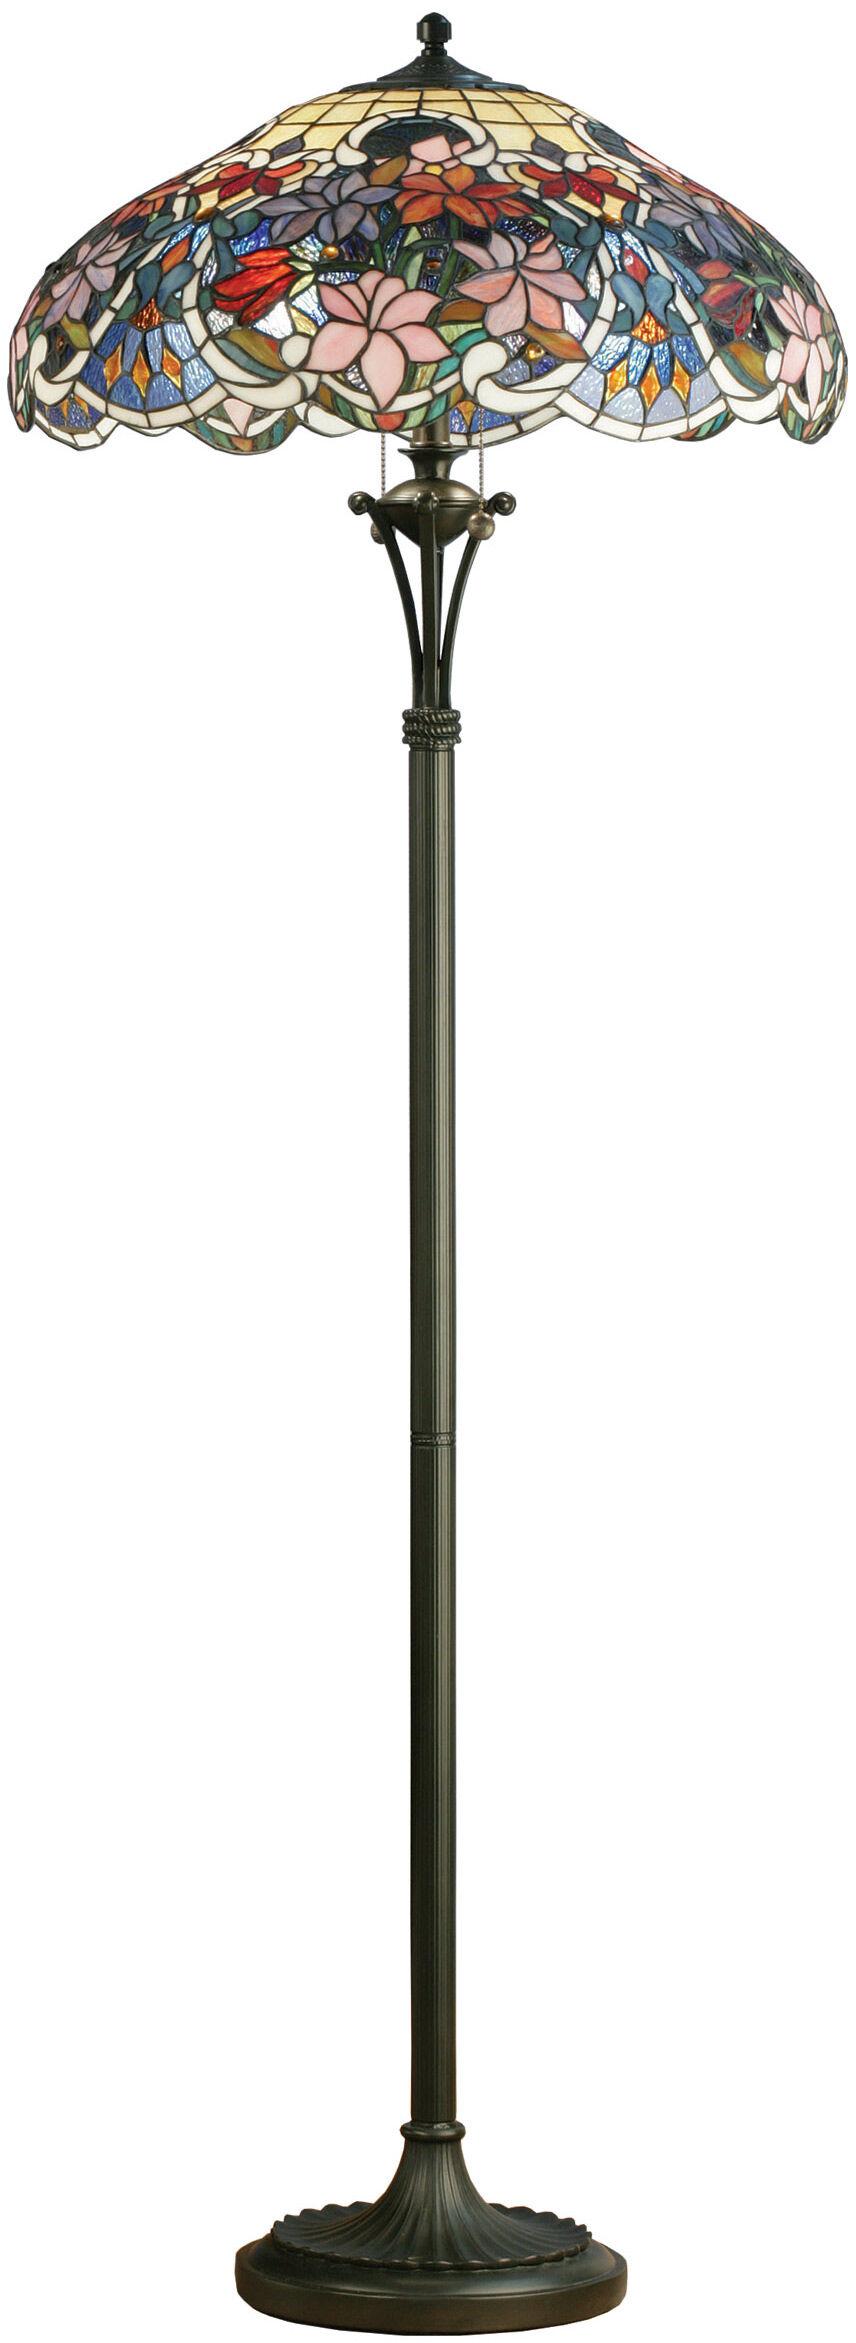 tiffany stehlampe clematis die waldrebe ars mundi. Black Bedroom Furniture Sets. Home Design Ideas